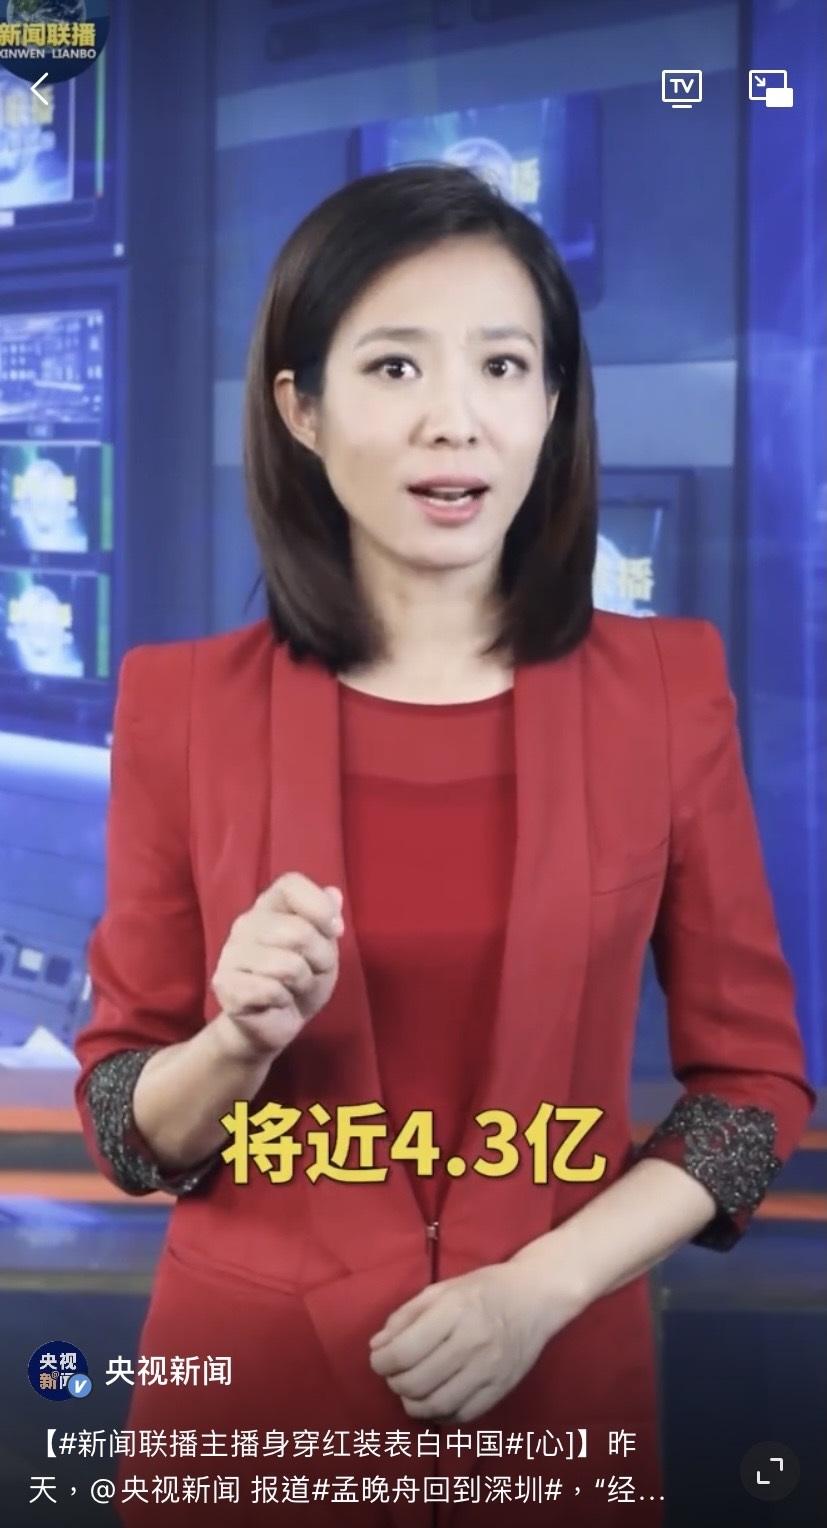 A female news anchor speaking in a screenshot video.